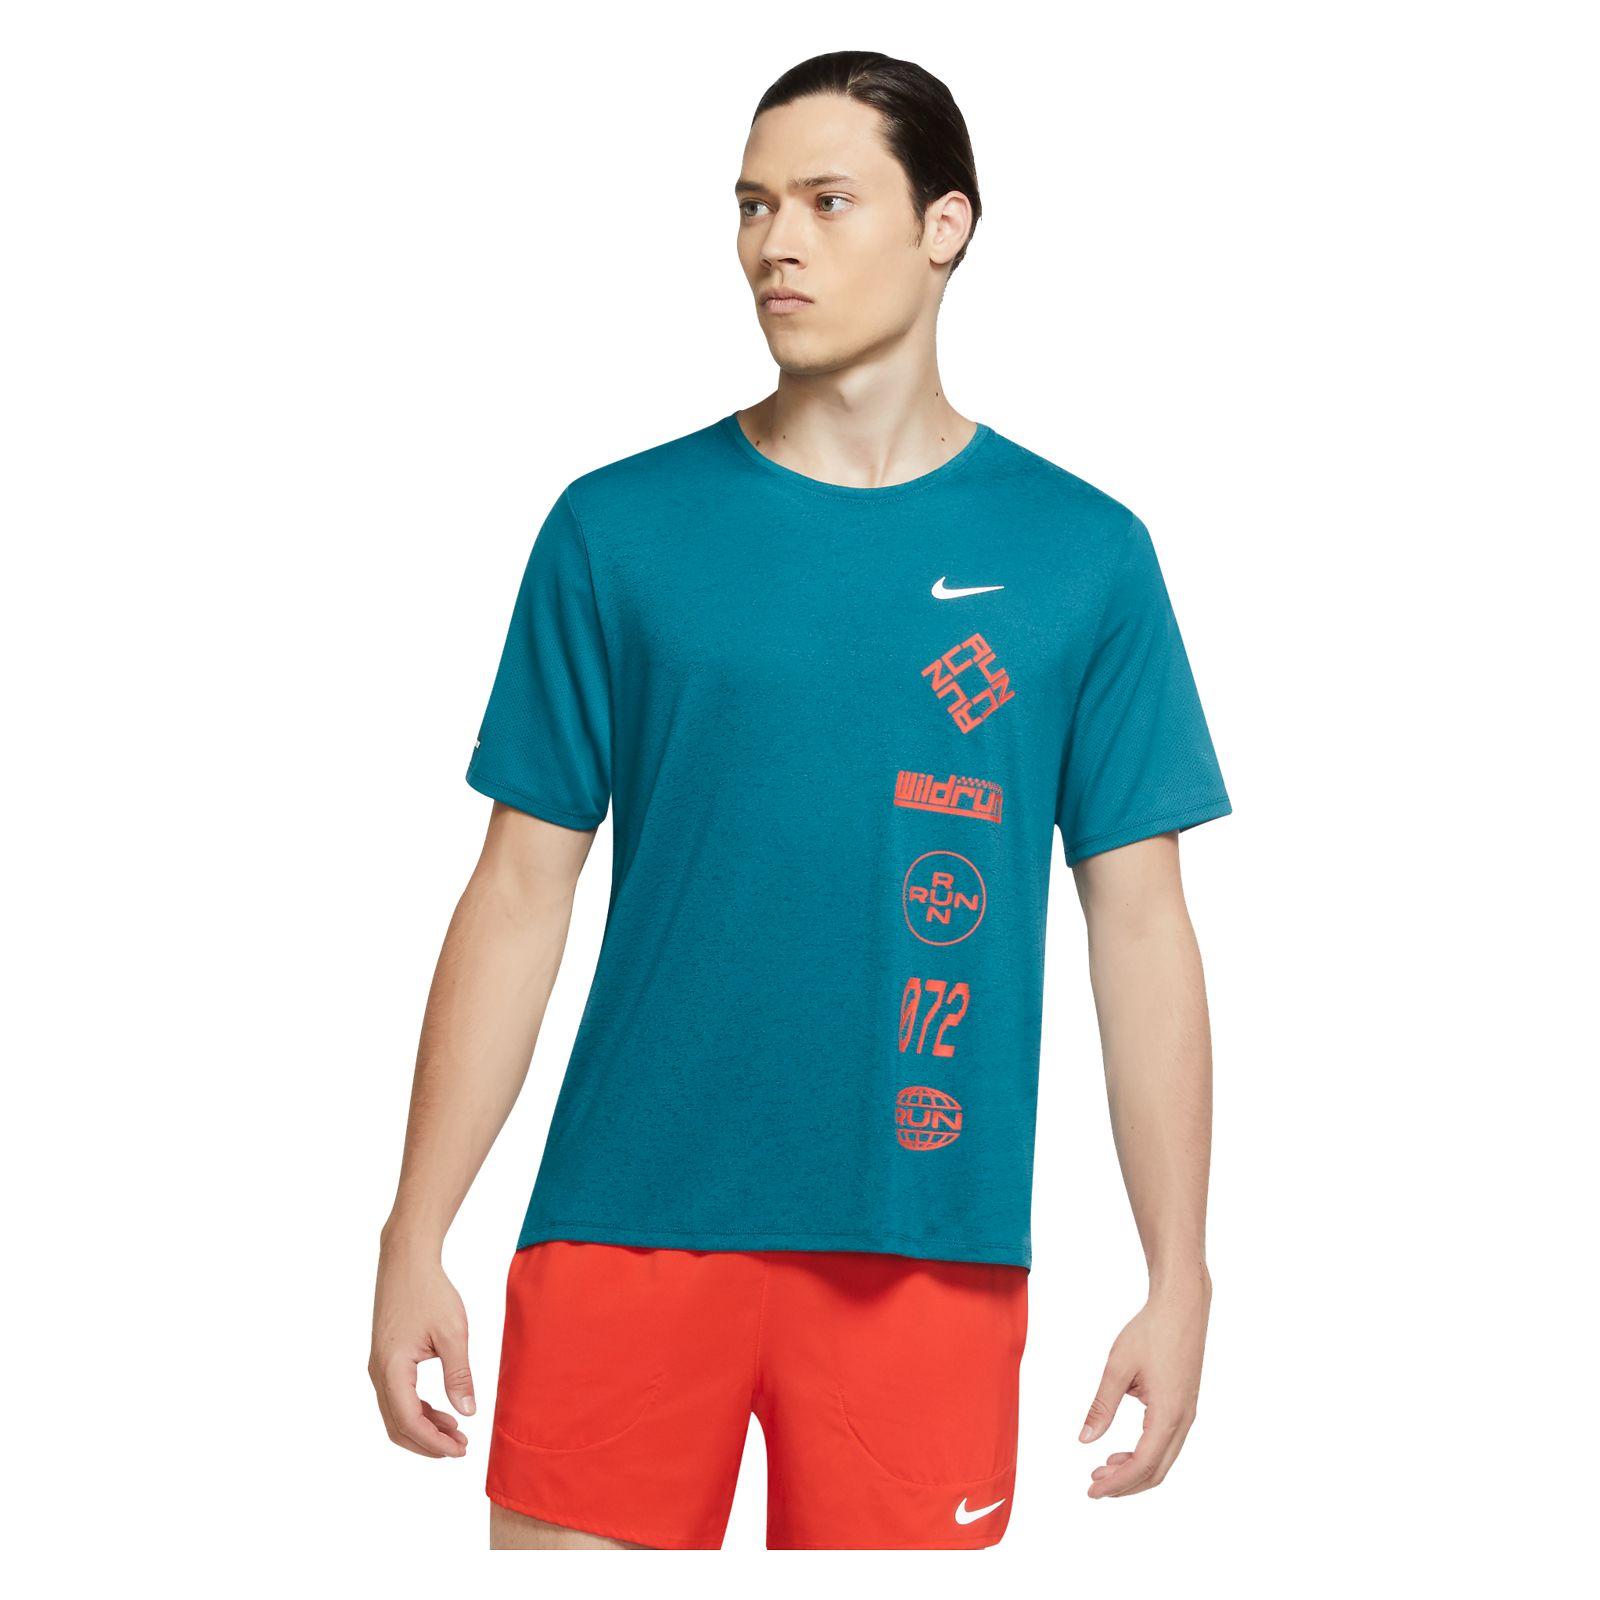 Koszulka do biegania męska Nike Miler Wild Run CU6038